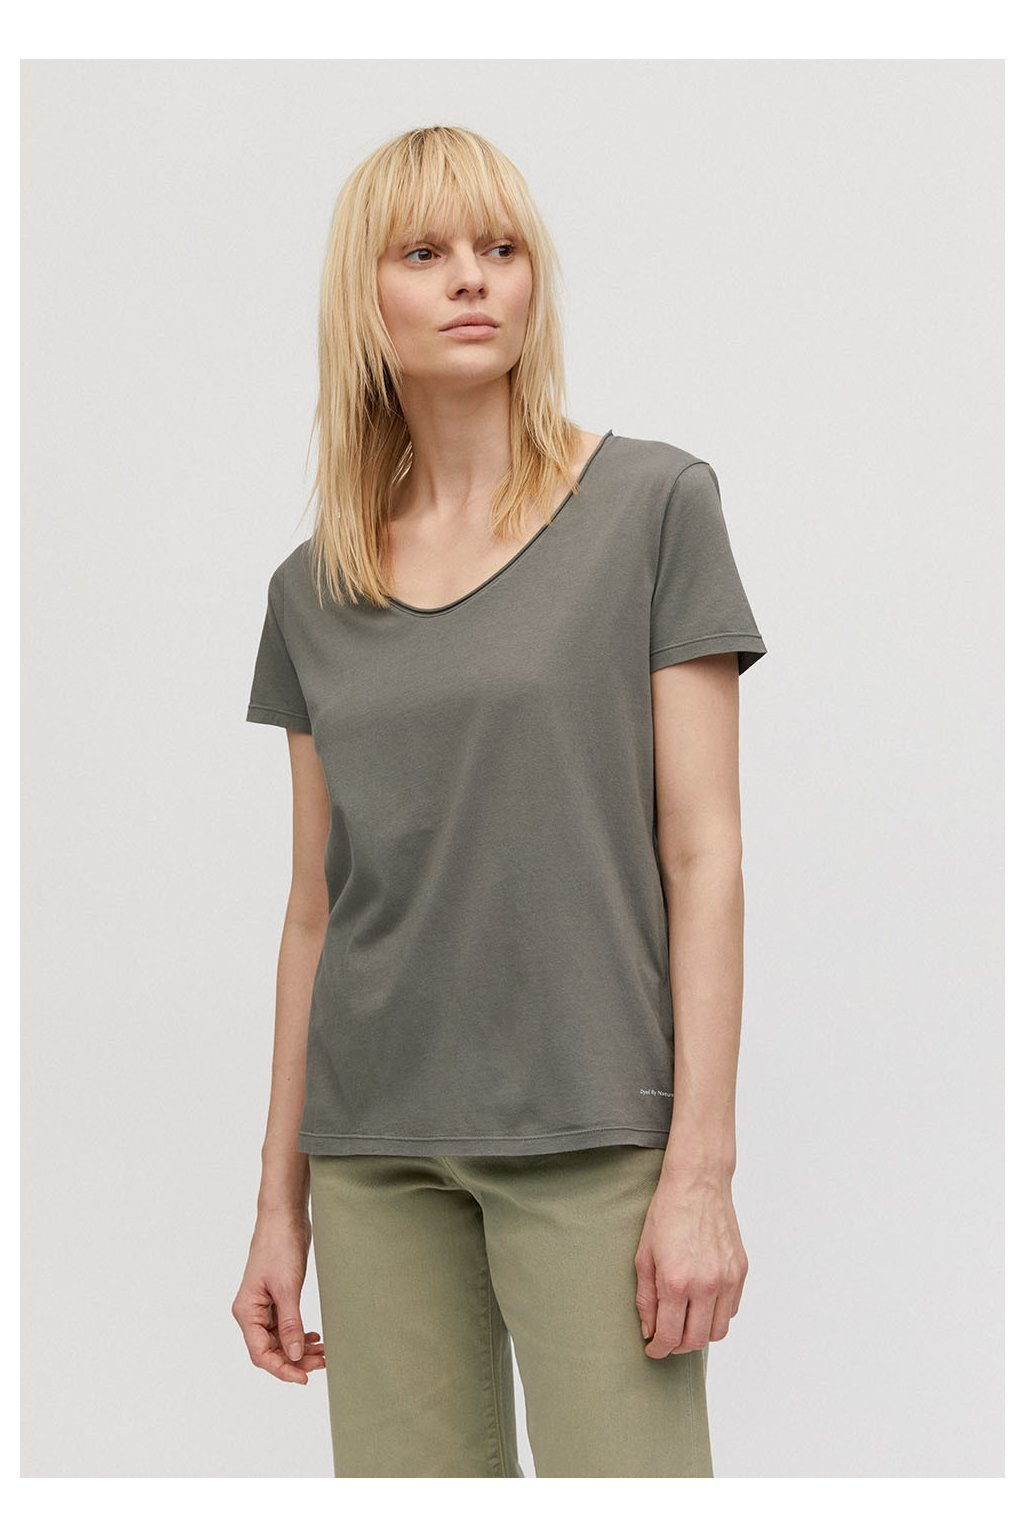 "Dámské zelené tričko ""HAADIA DYED BY NATURE natural khaki"" (Velikost L)"